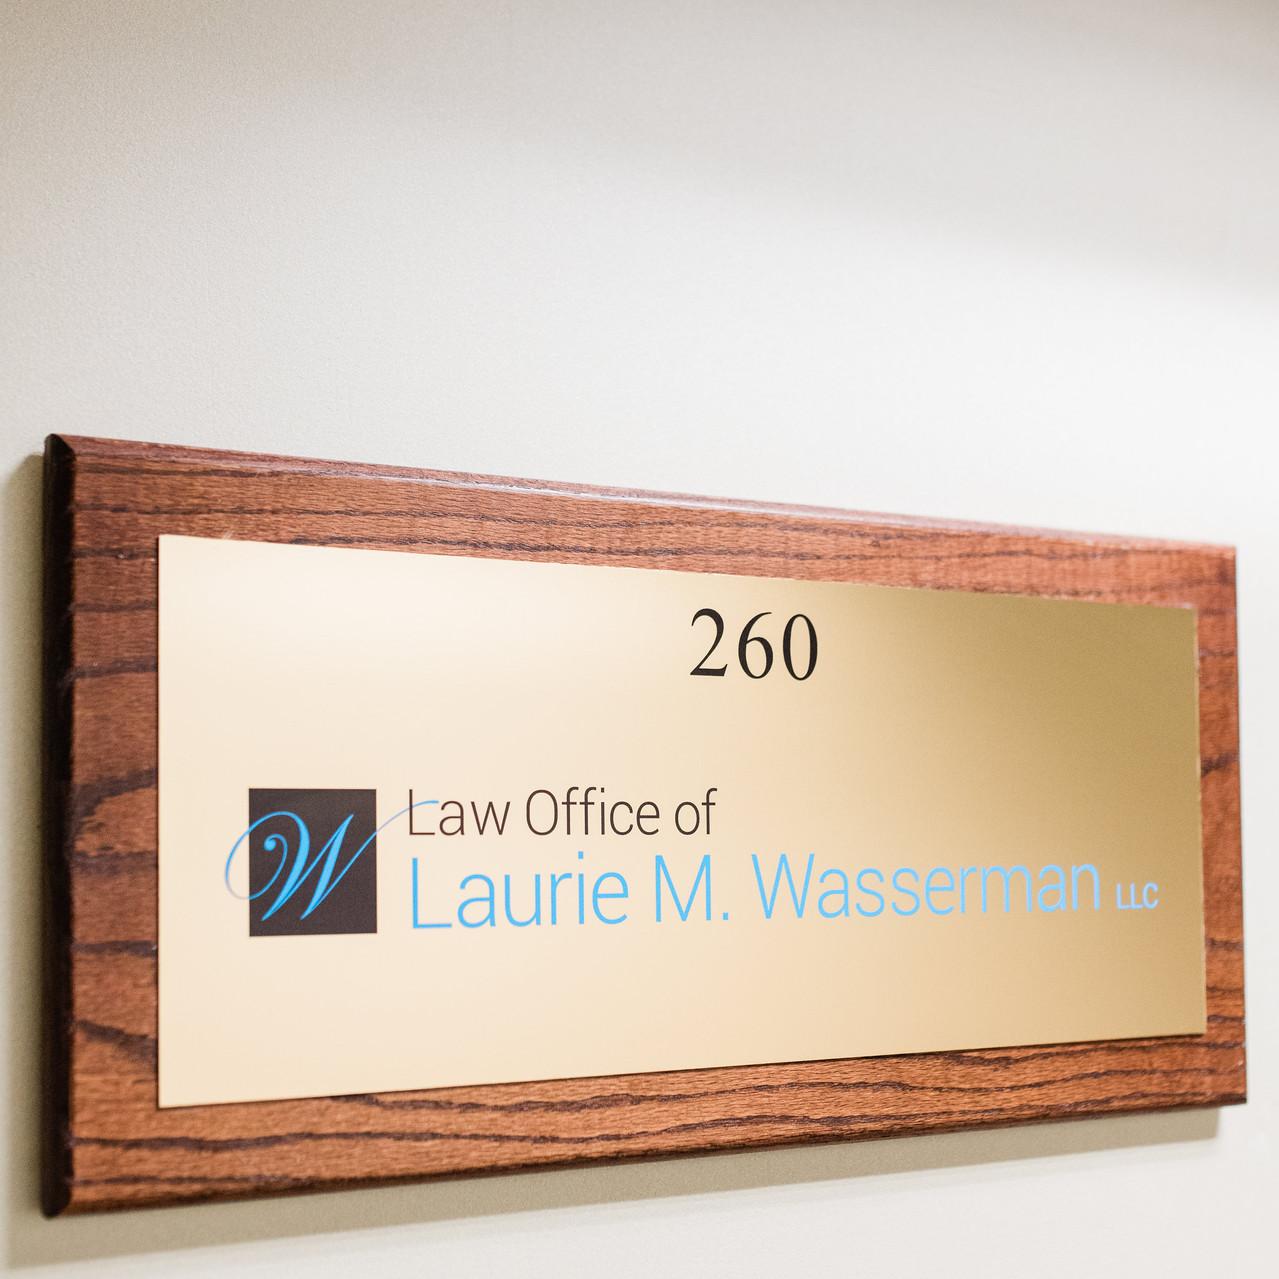 LawofficesofLaurieWasserman-PhotosbyBKLP-4